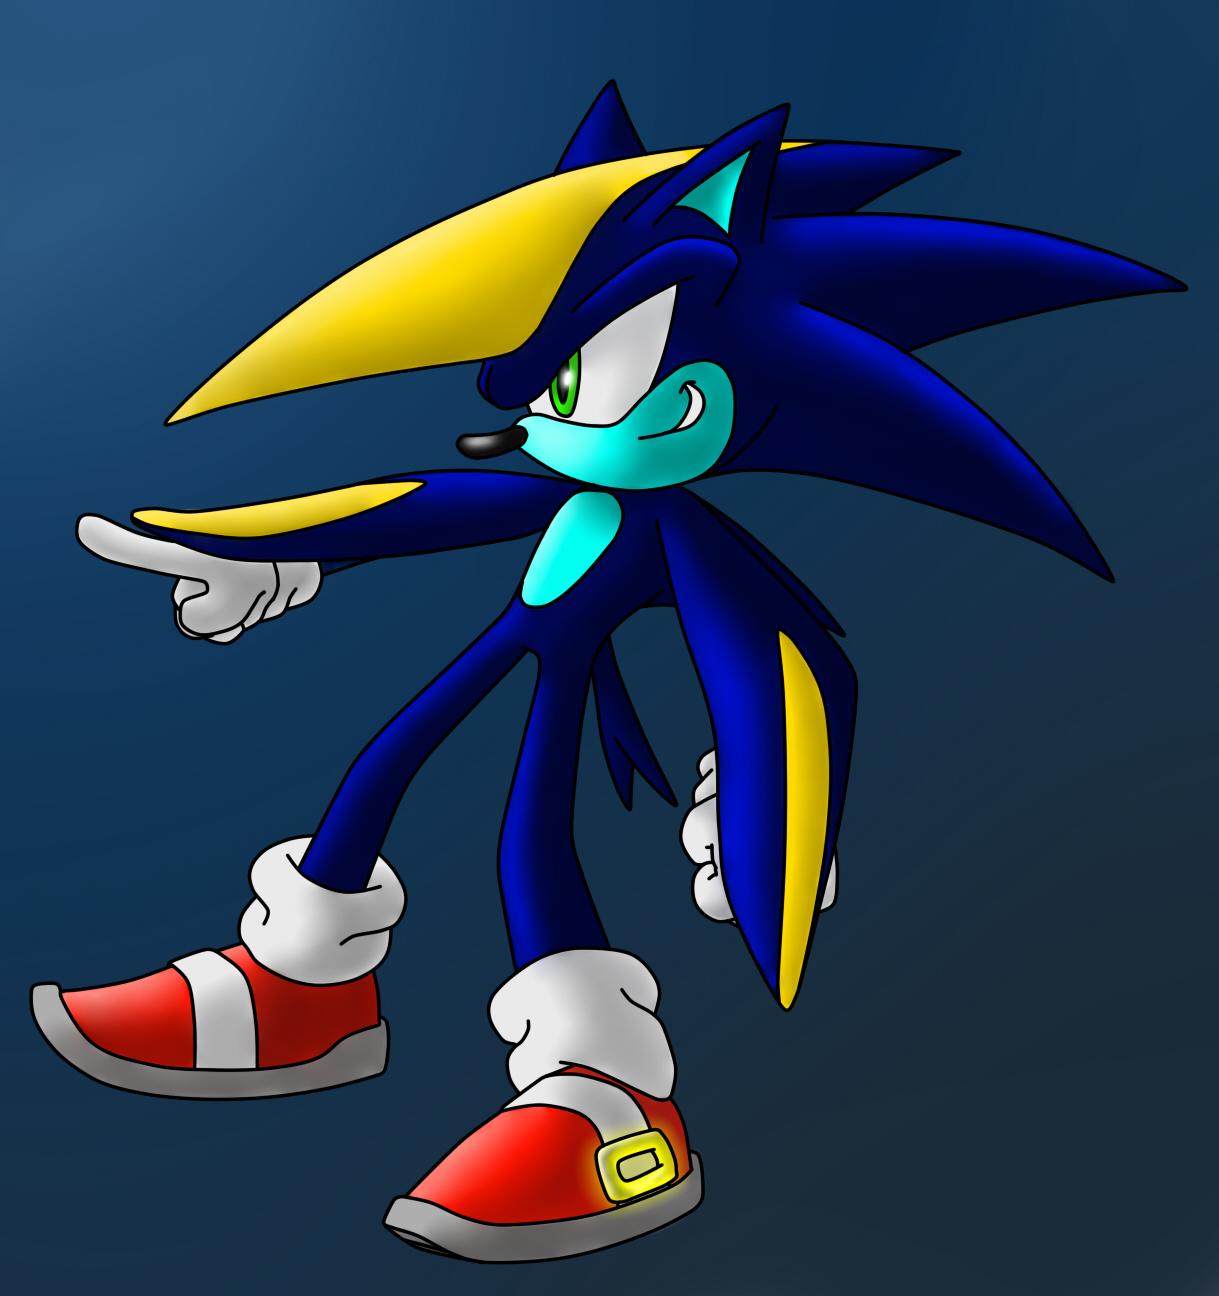 Sonic Forms: Penguin Sonic By Sweecrue On DeviantArt